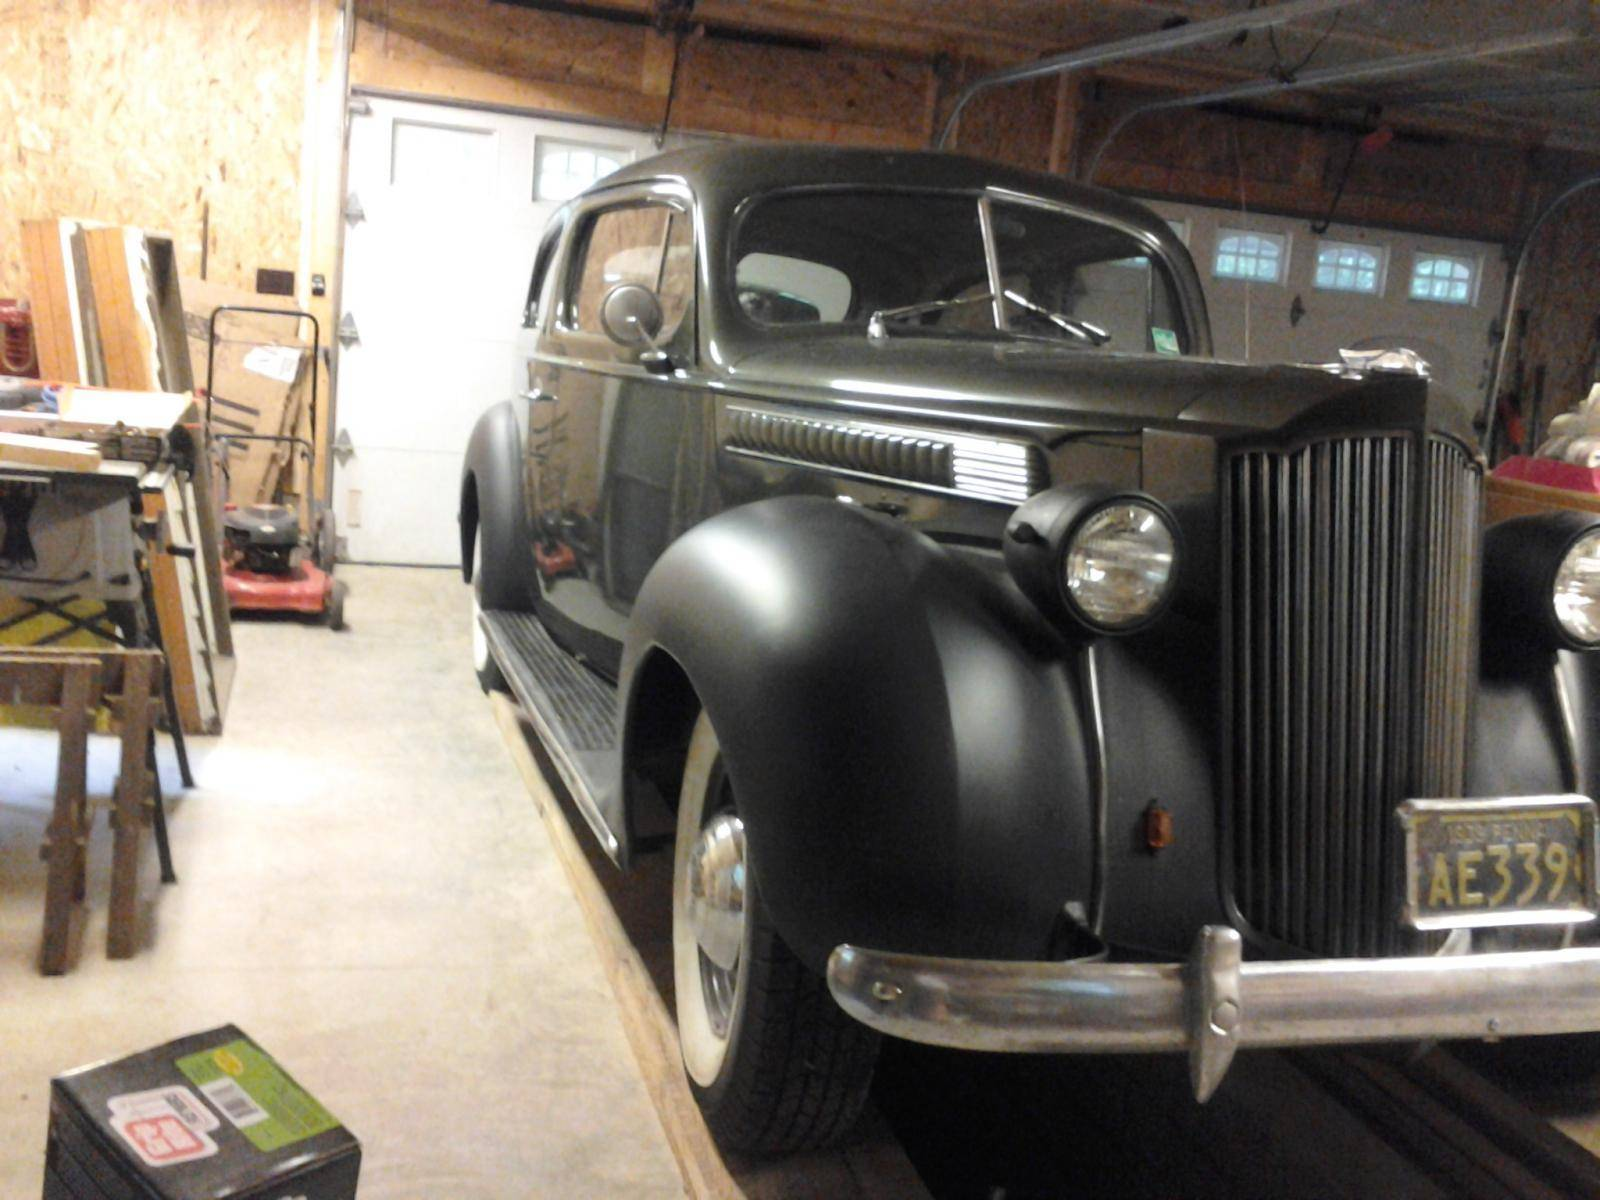 1939 1700, 6 cylinder, 2 door sedan